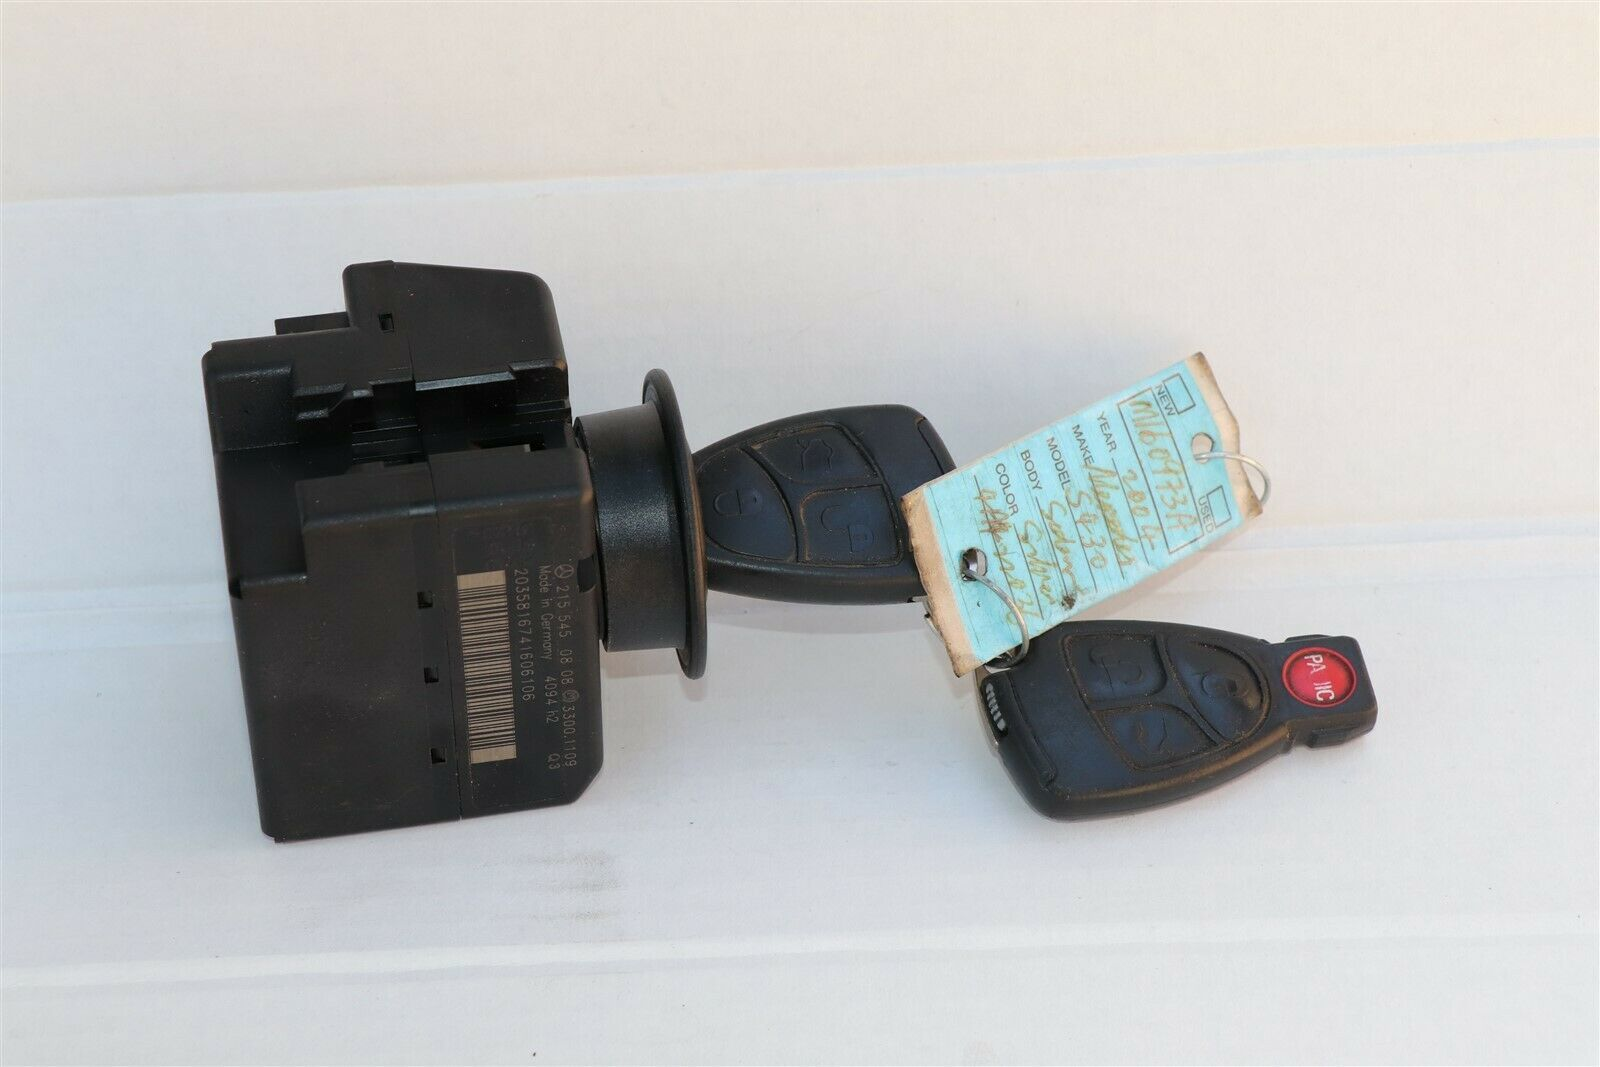 Mercedes Ignition Start Switch Module & Key Fob Keyless Entry Remote 2155450808